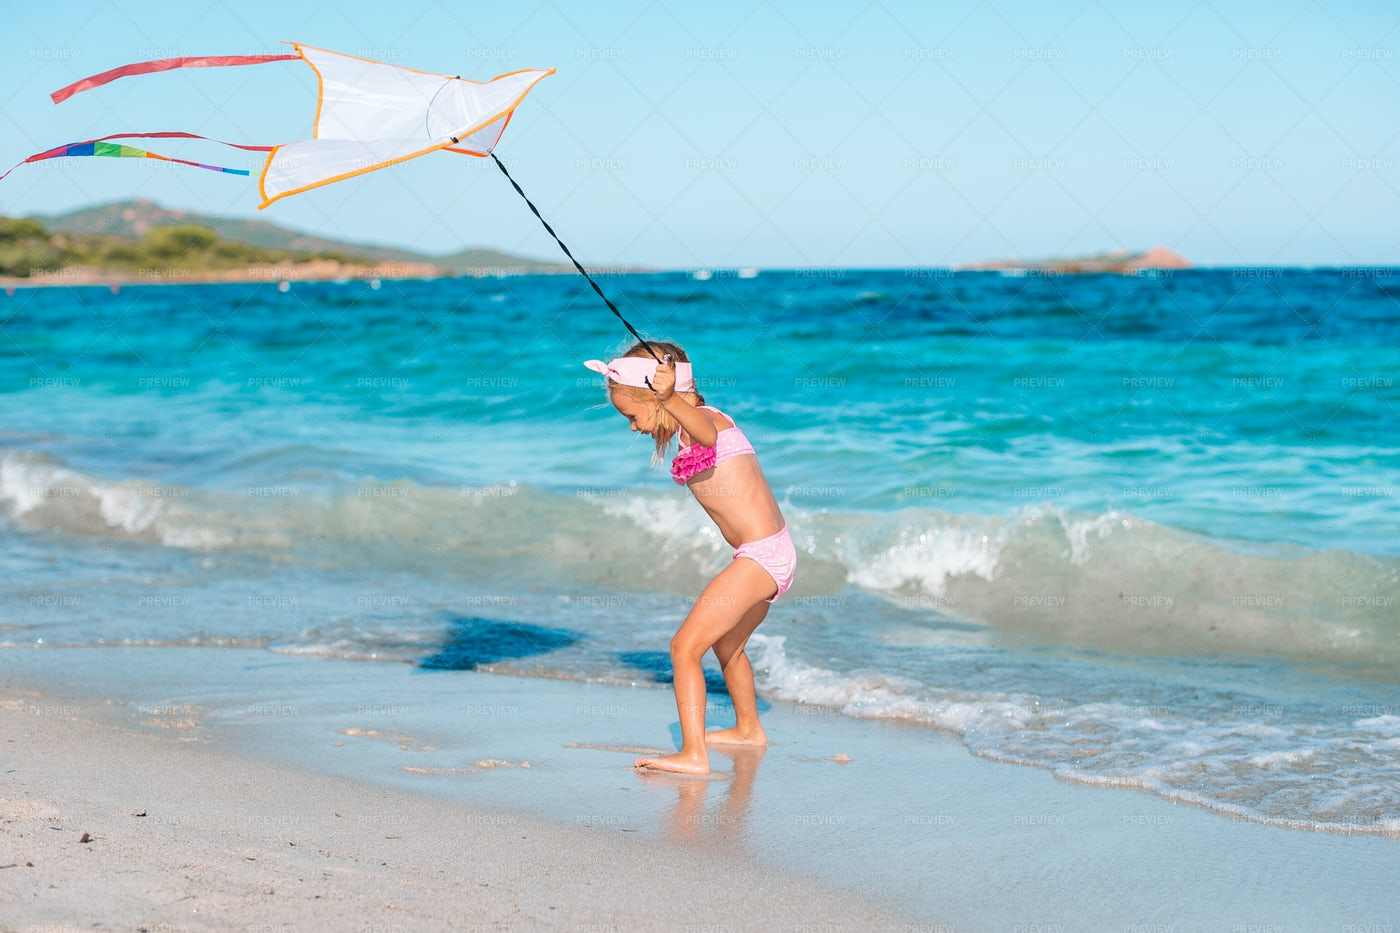 Pulling A Kite On The Beach: Stock Photos